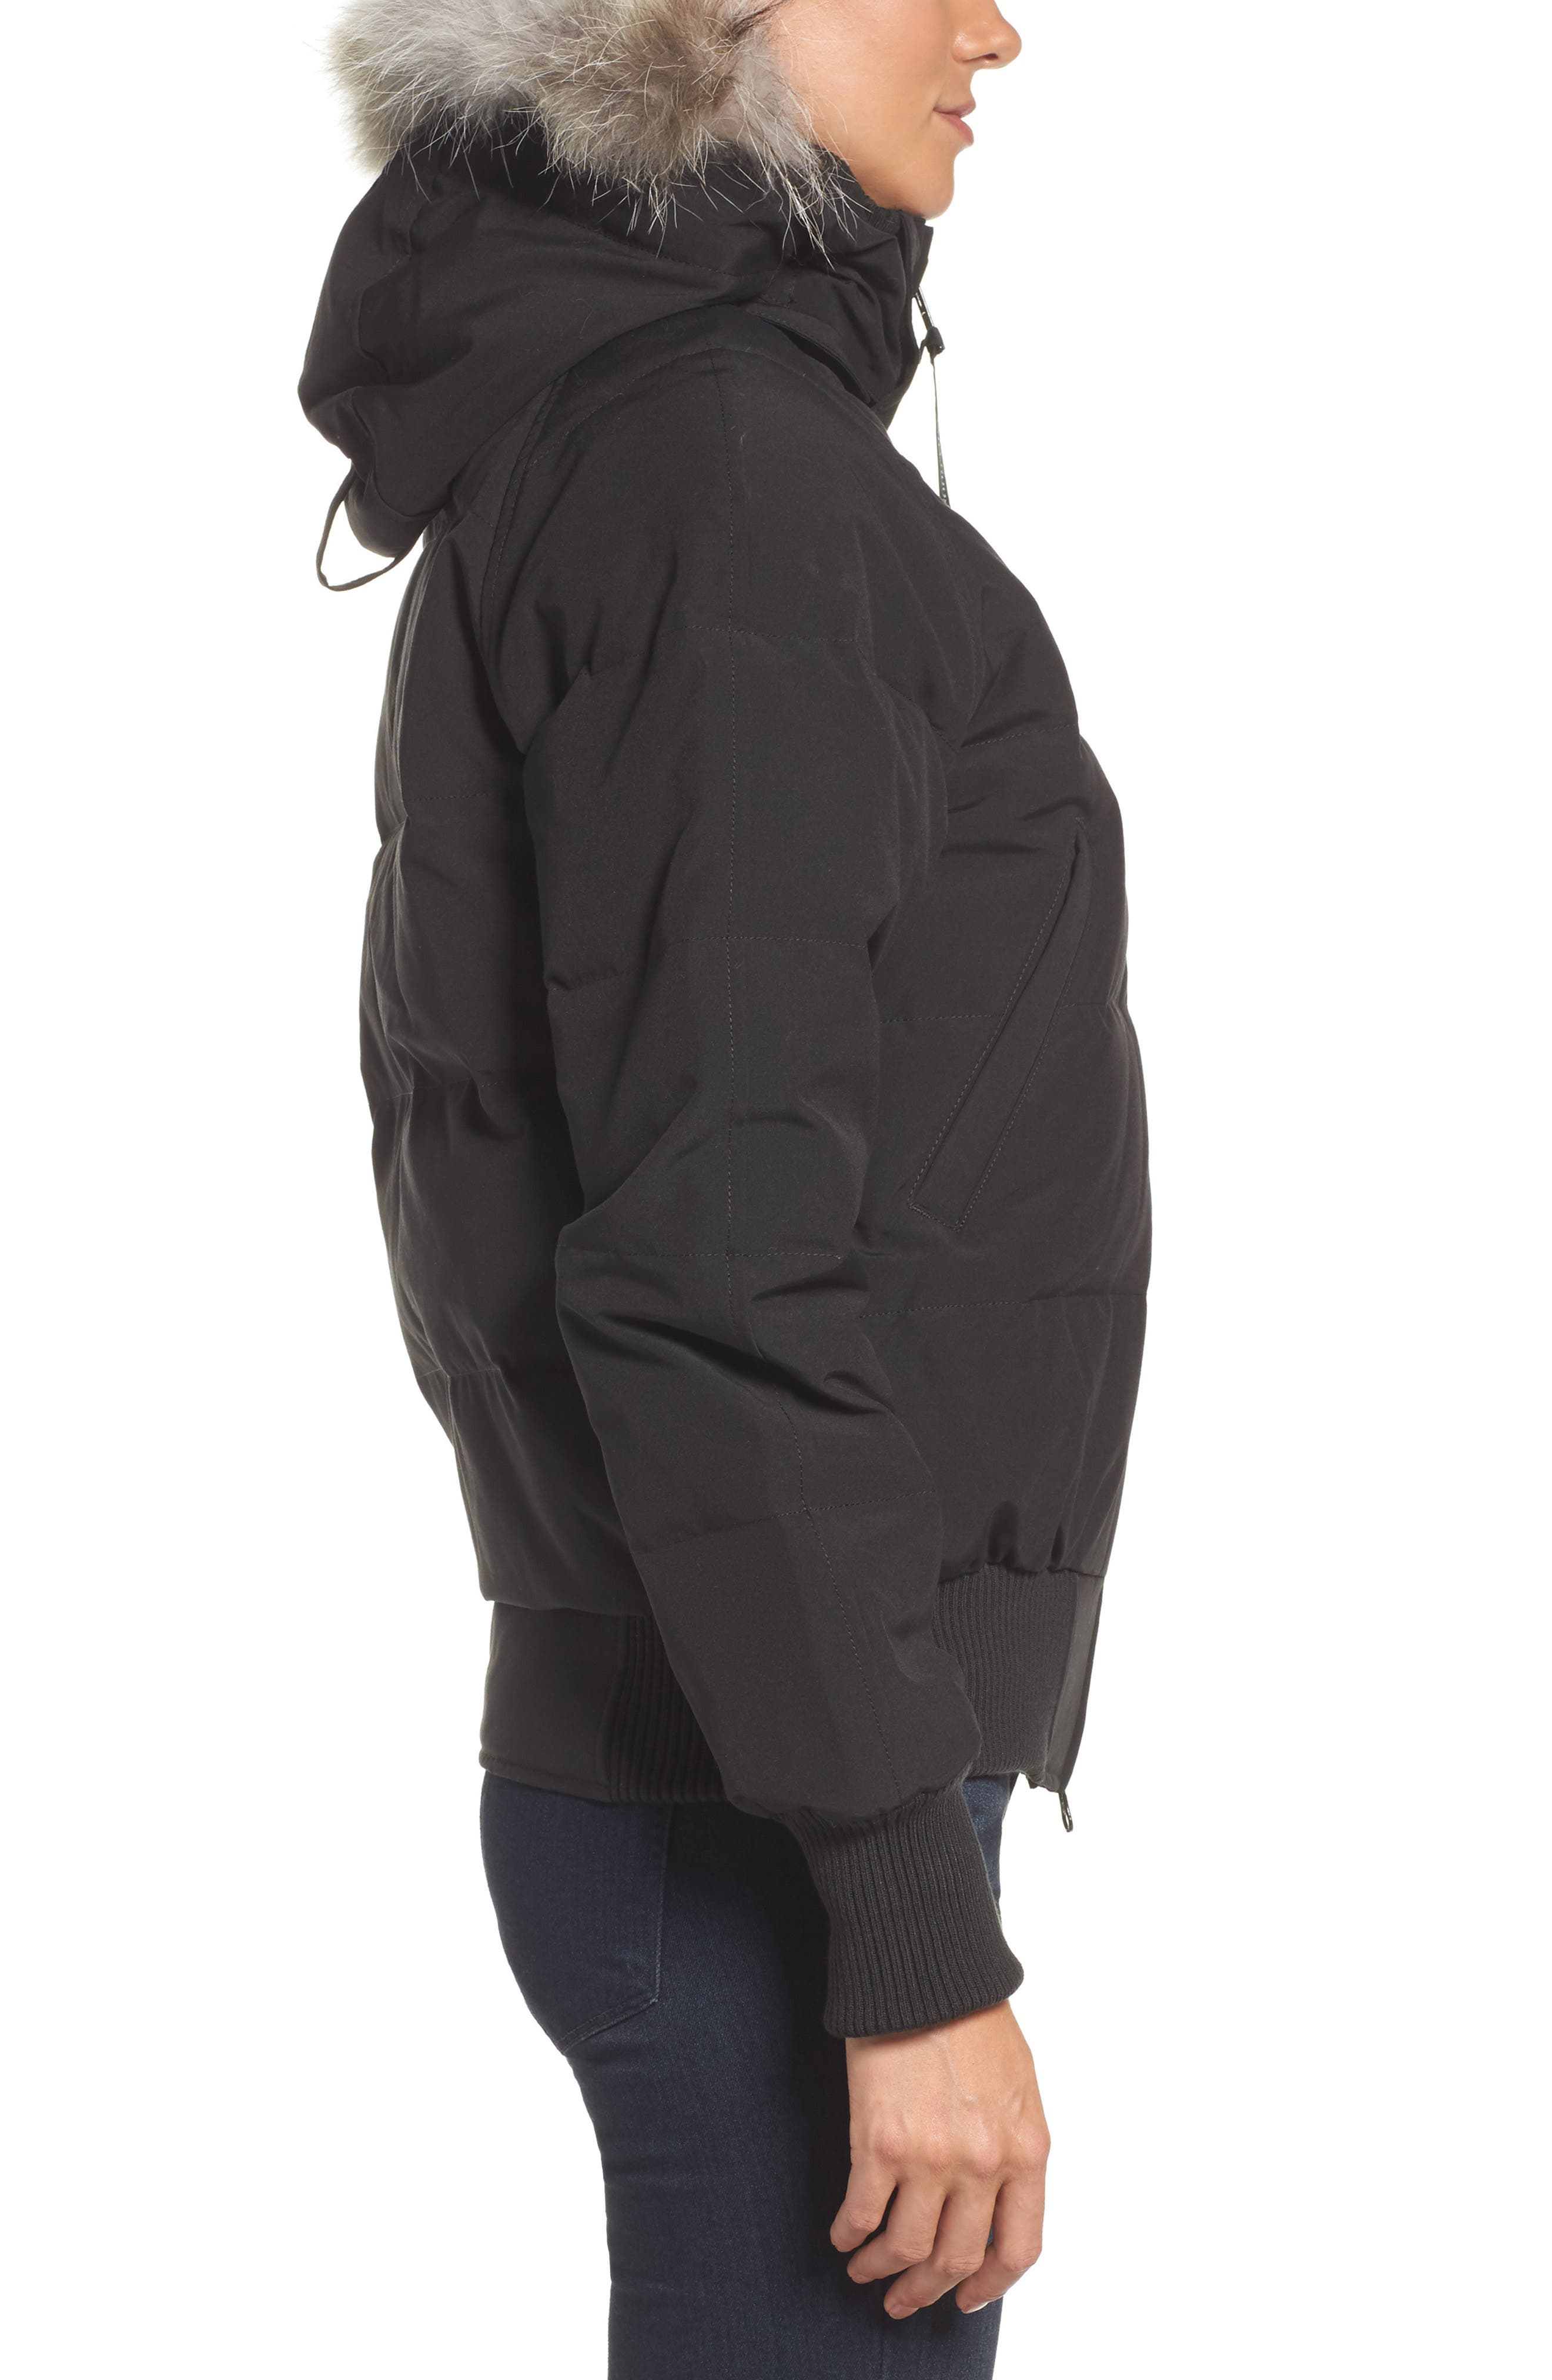 'Savona' Bomber Jacket with Genuine Coyote Fur Trim,                             Alternate thumbnail 3, color,                             Black